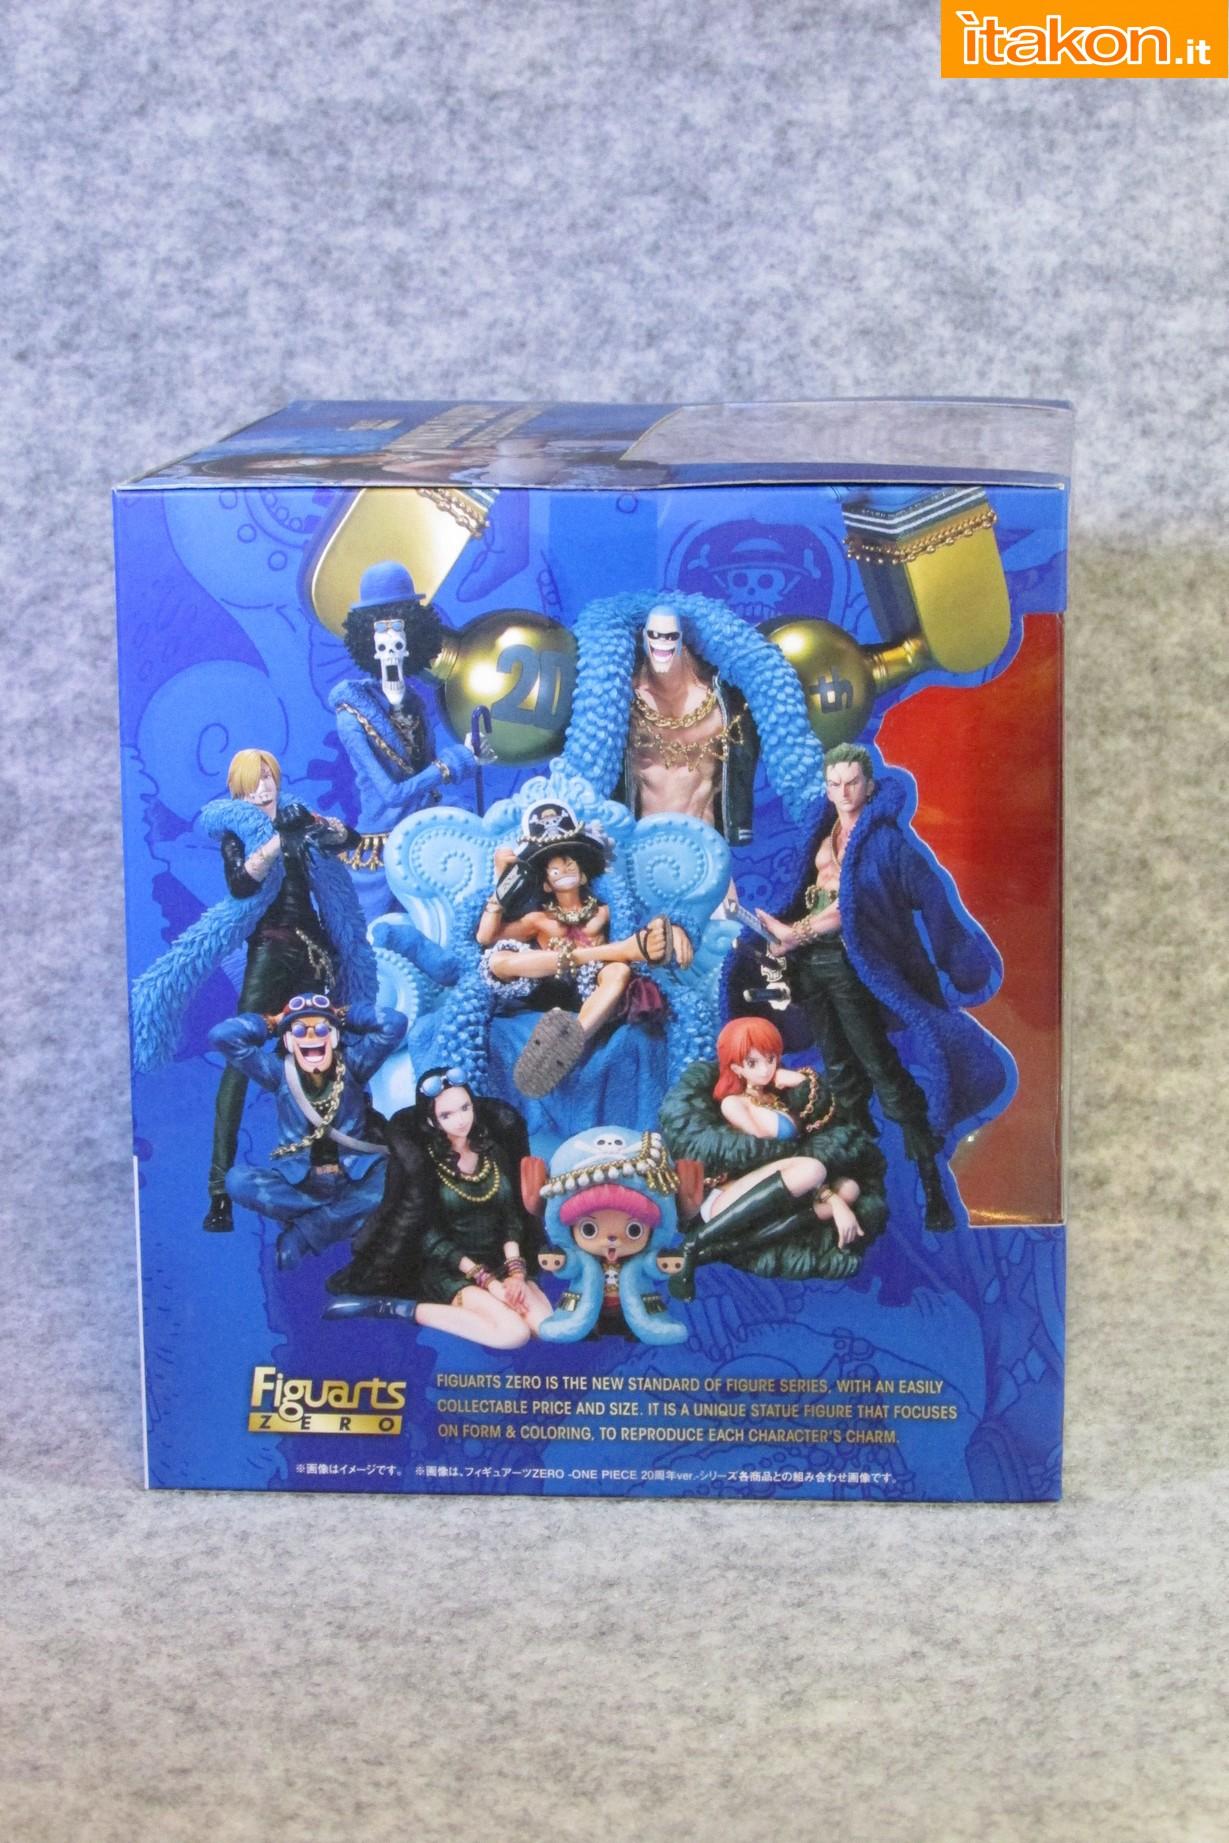 Link a Recensione Review Monkey D. Luffy One Piece 20th Anniversary ver. Figuarts ZERO di Bandai 03